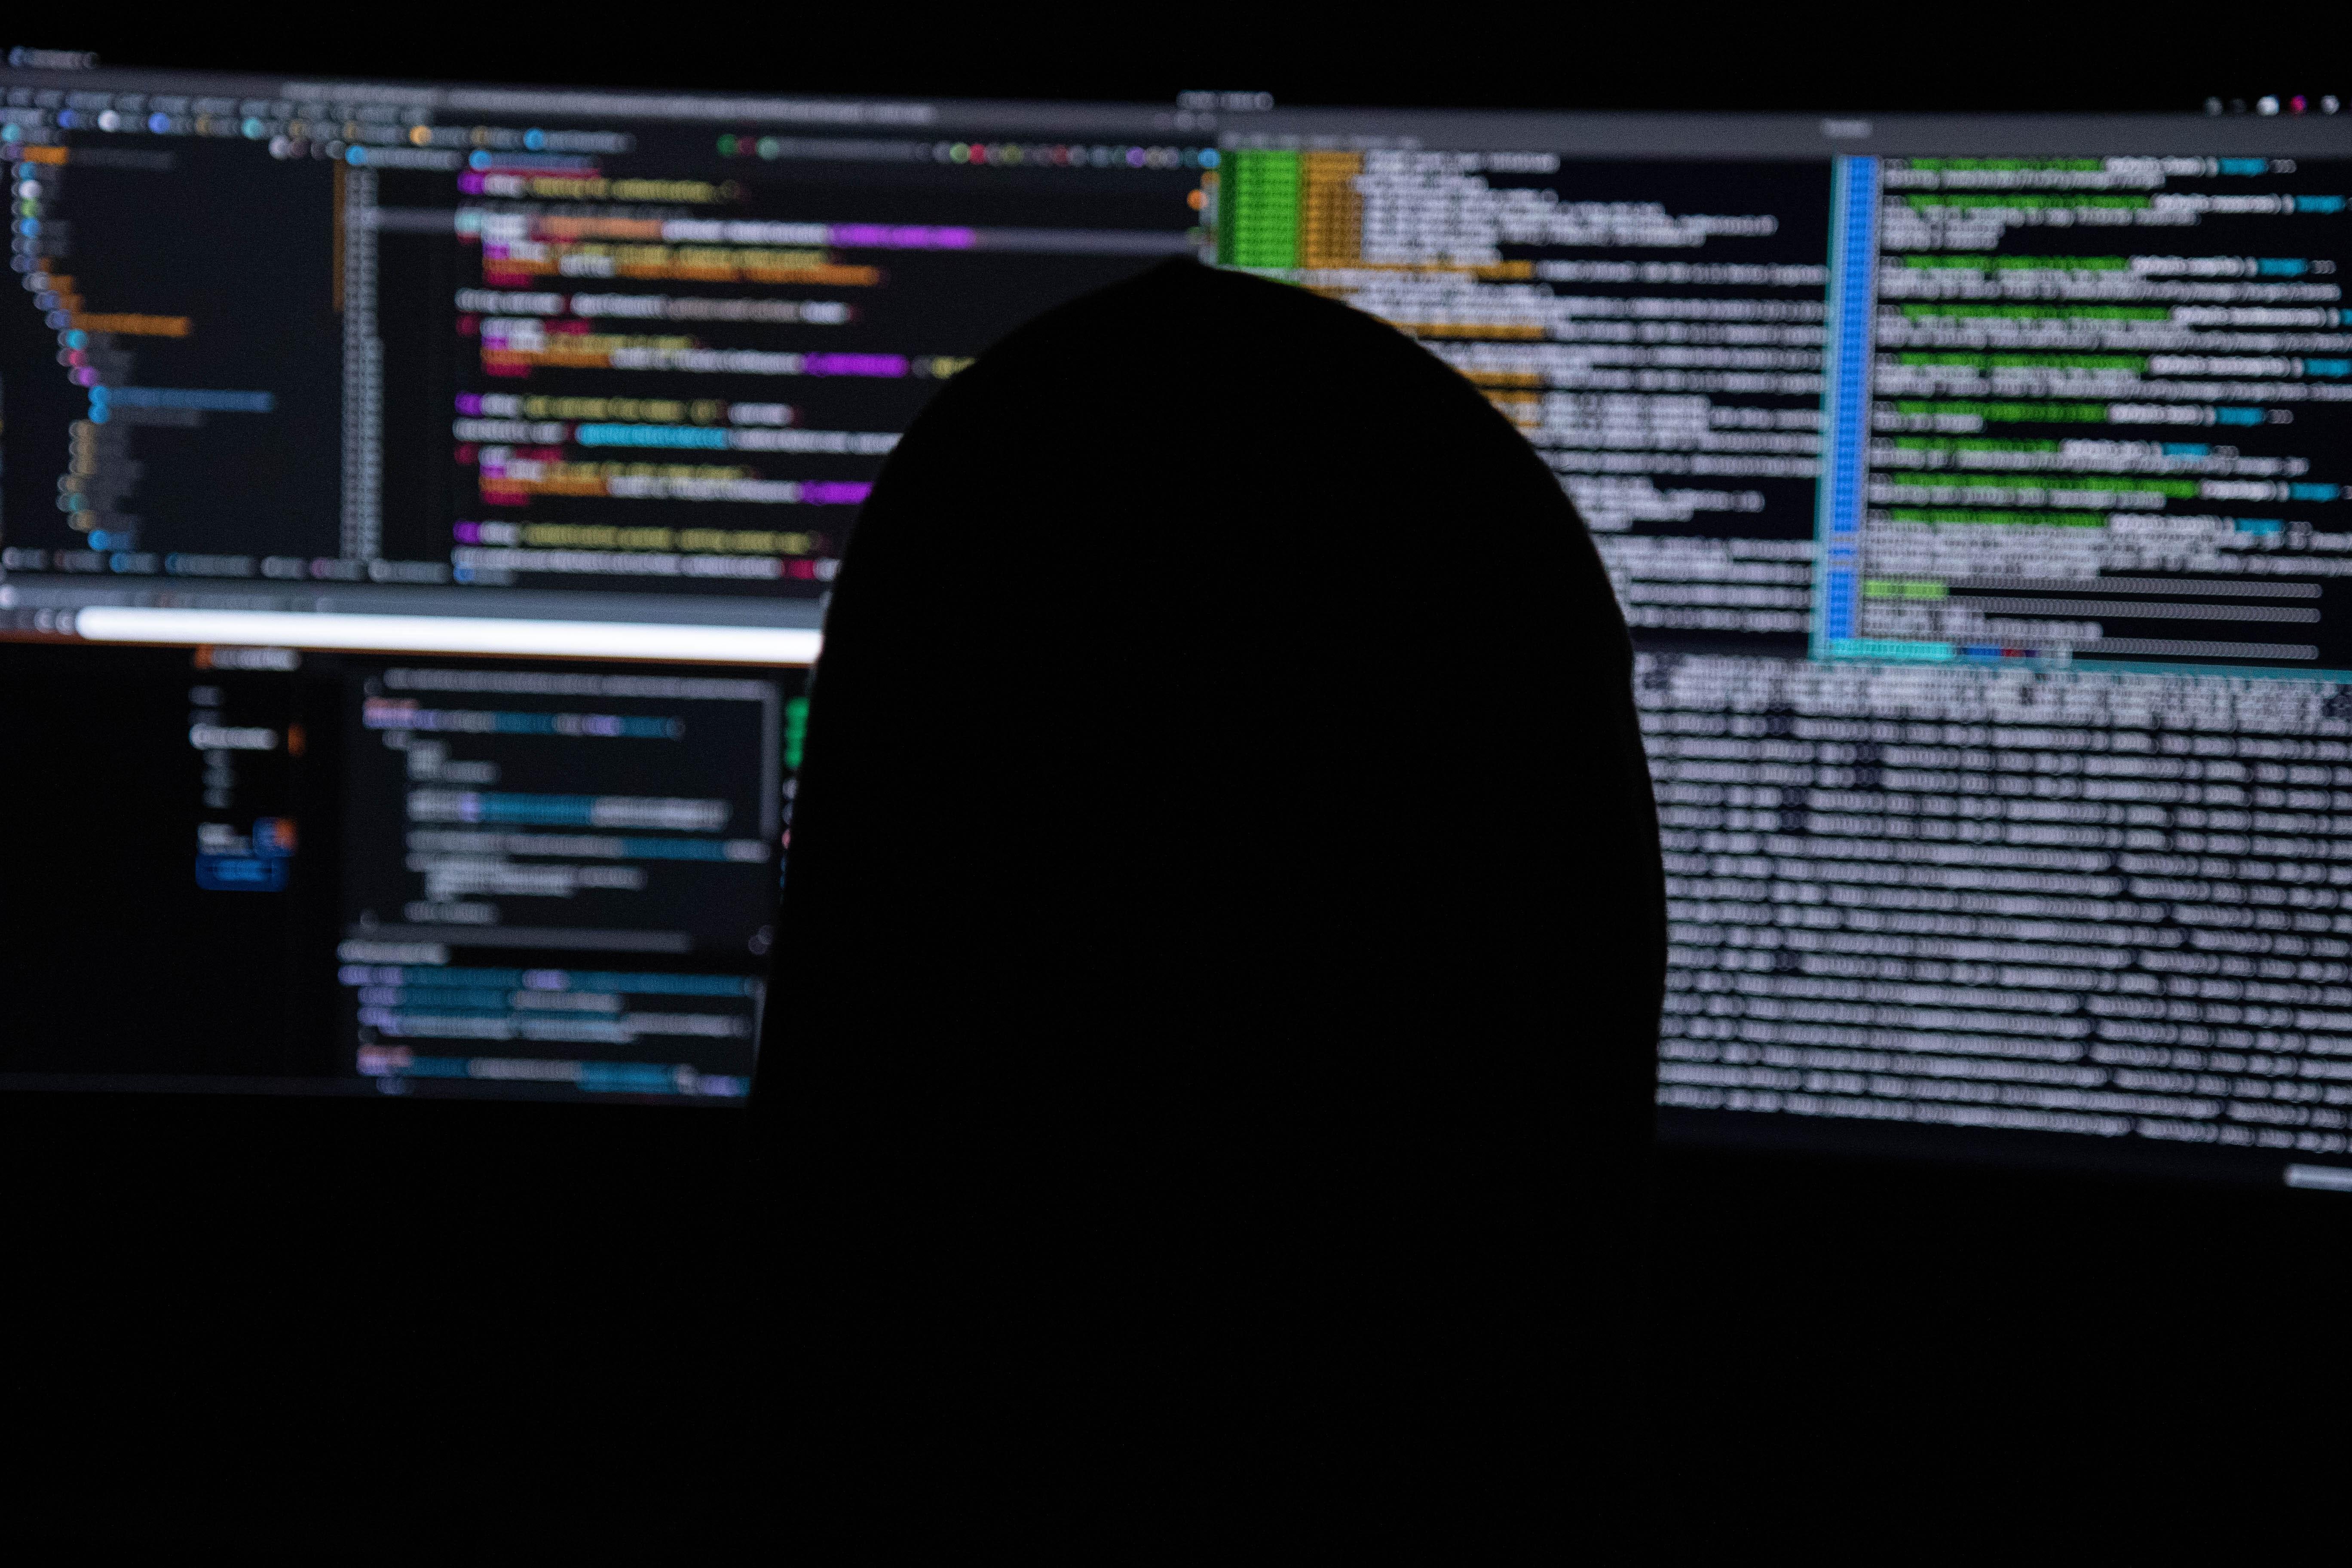 "Photo by <a href=""https://unsplash.com/@hidd3n?utm_source=unsplash&utm_medium=referral&utm_content=creditCopyText"">Kevin Horvat</a> on <a href=""https://unsplash.com/s/photos/hacker?utm_source=unsplash&utm_medium=referral&utm_content=creditCopyText"">Unsplash</a>"